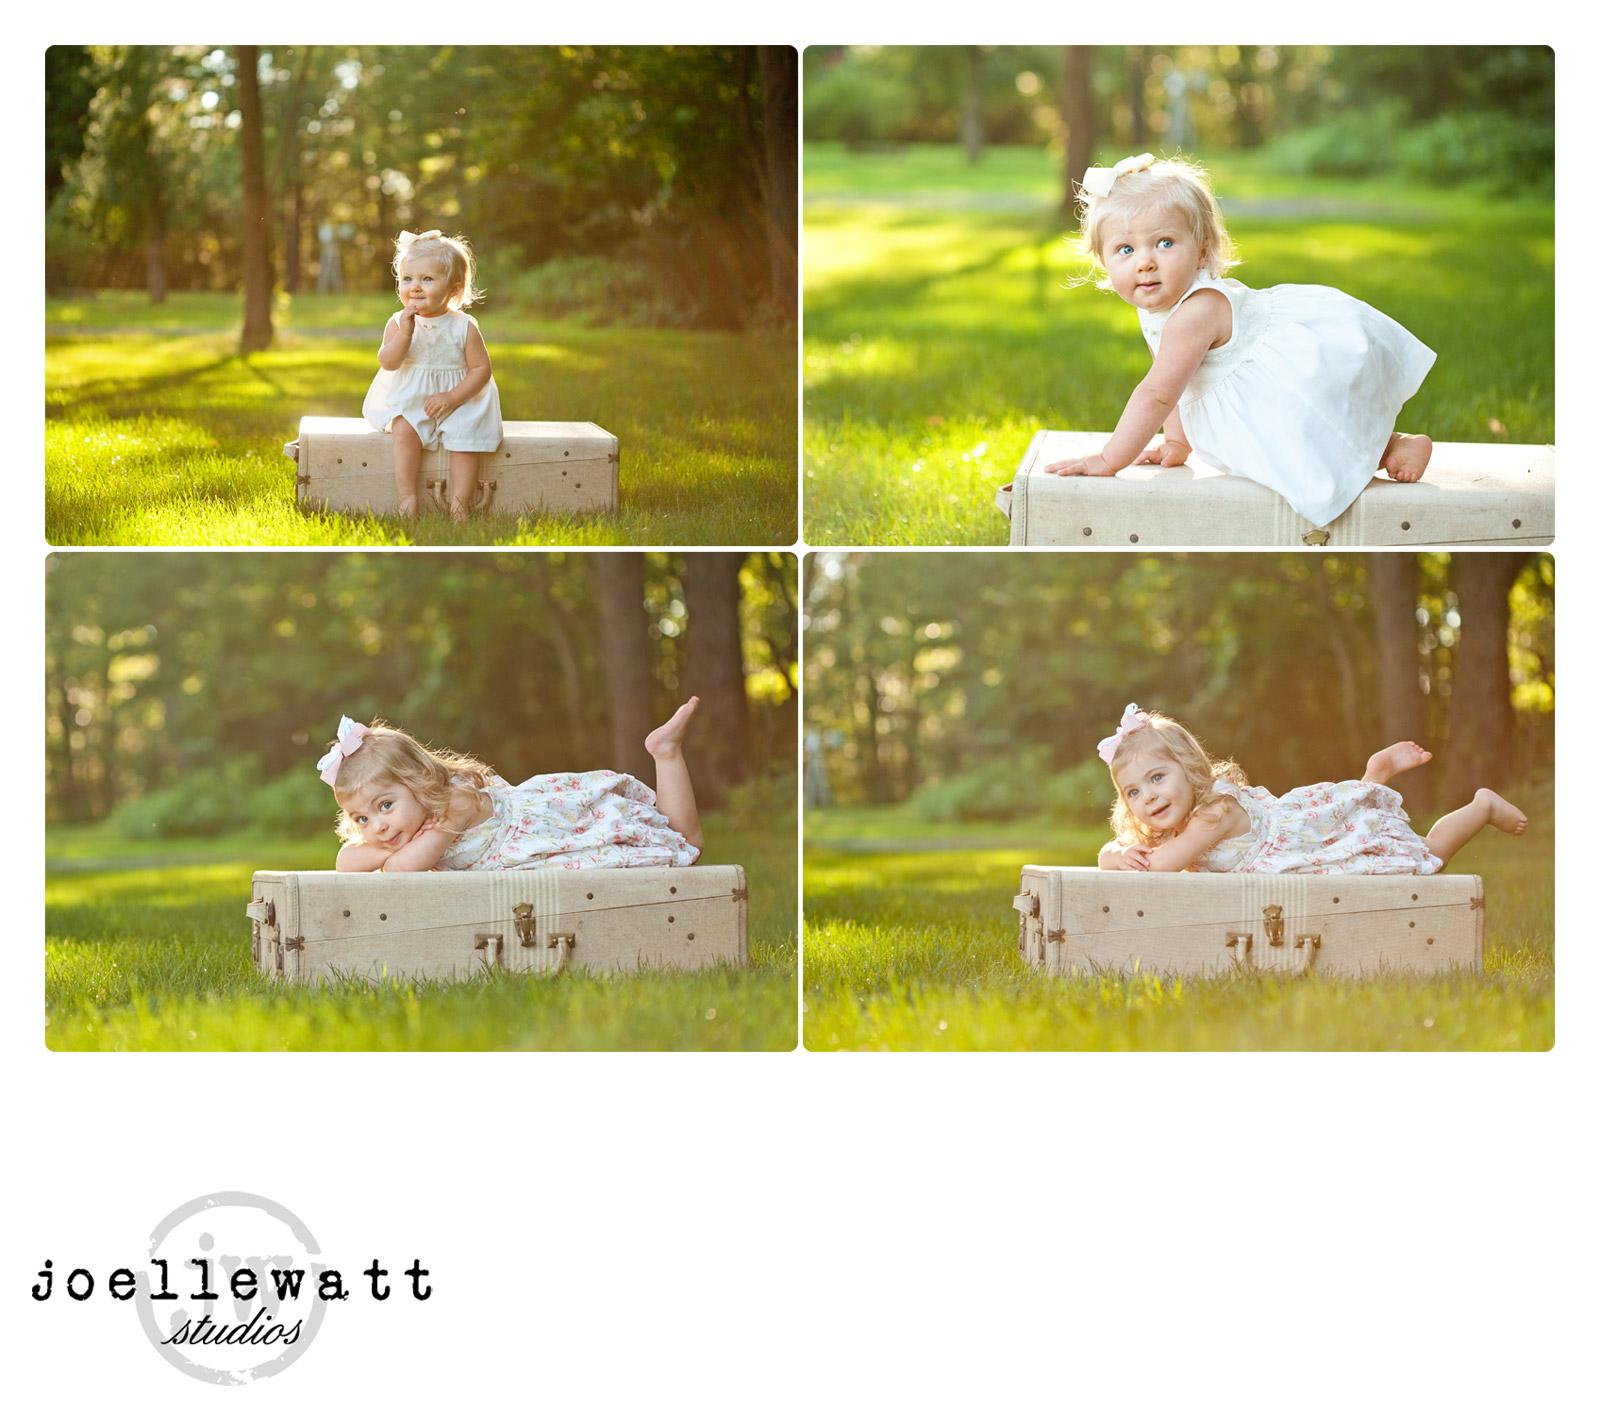 Blog-Collage-1375277318512.jpg